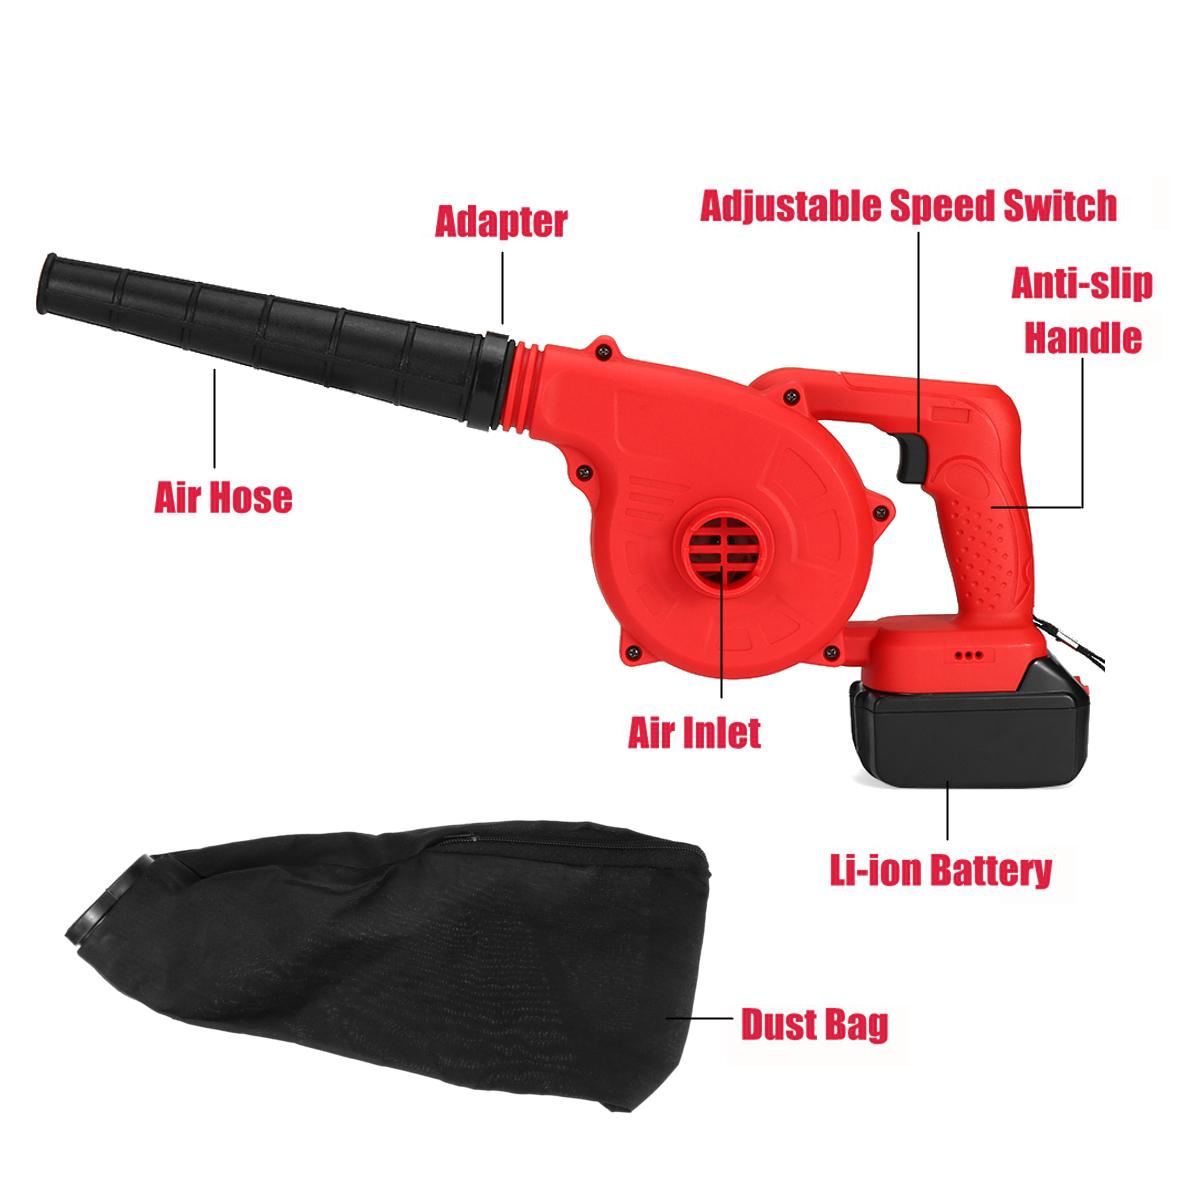 128VF 19800mAh Li-Ion Battery Electric Cordless Blower Air Leaf Dust Blower Power Tools